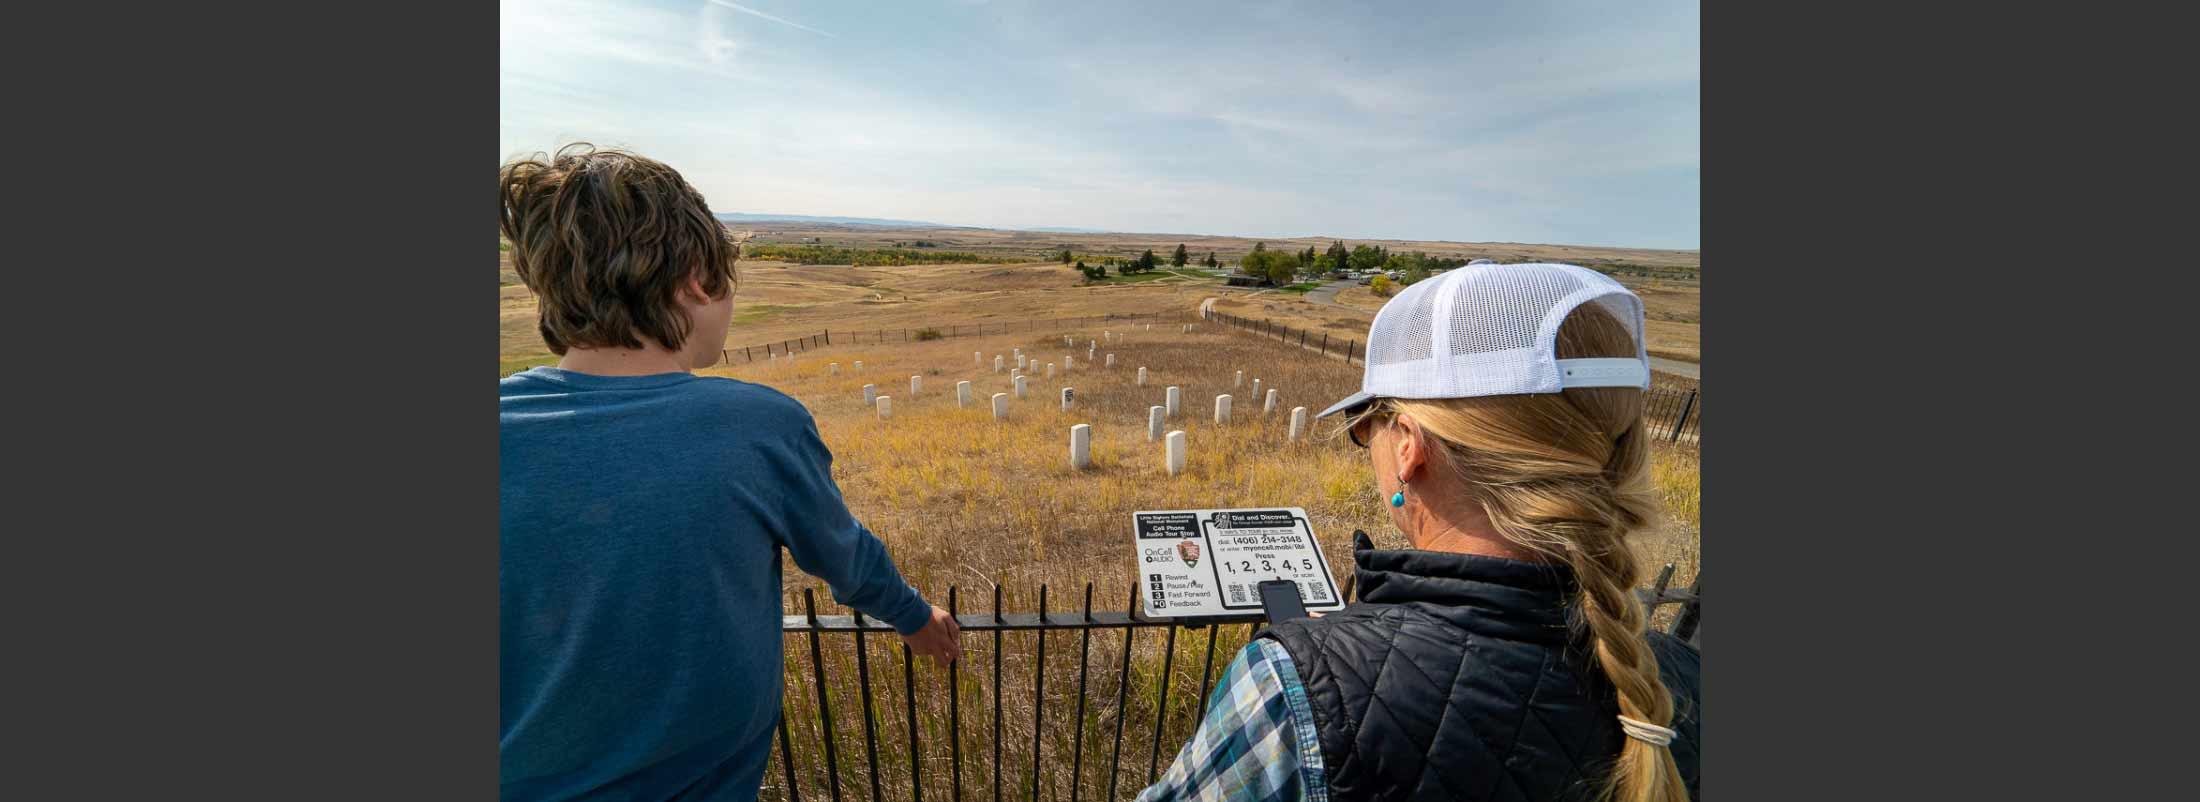 Visiting Battlefields in Montana